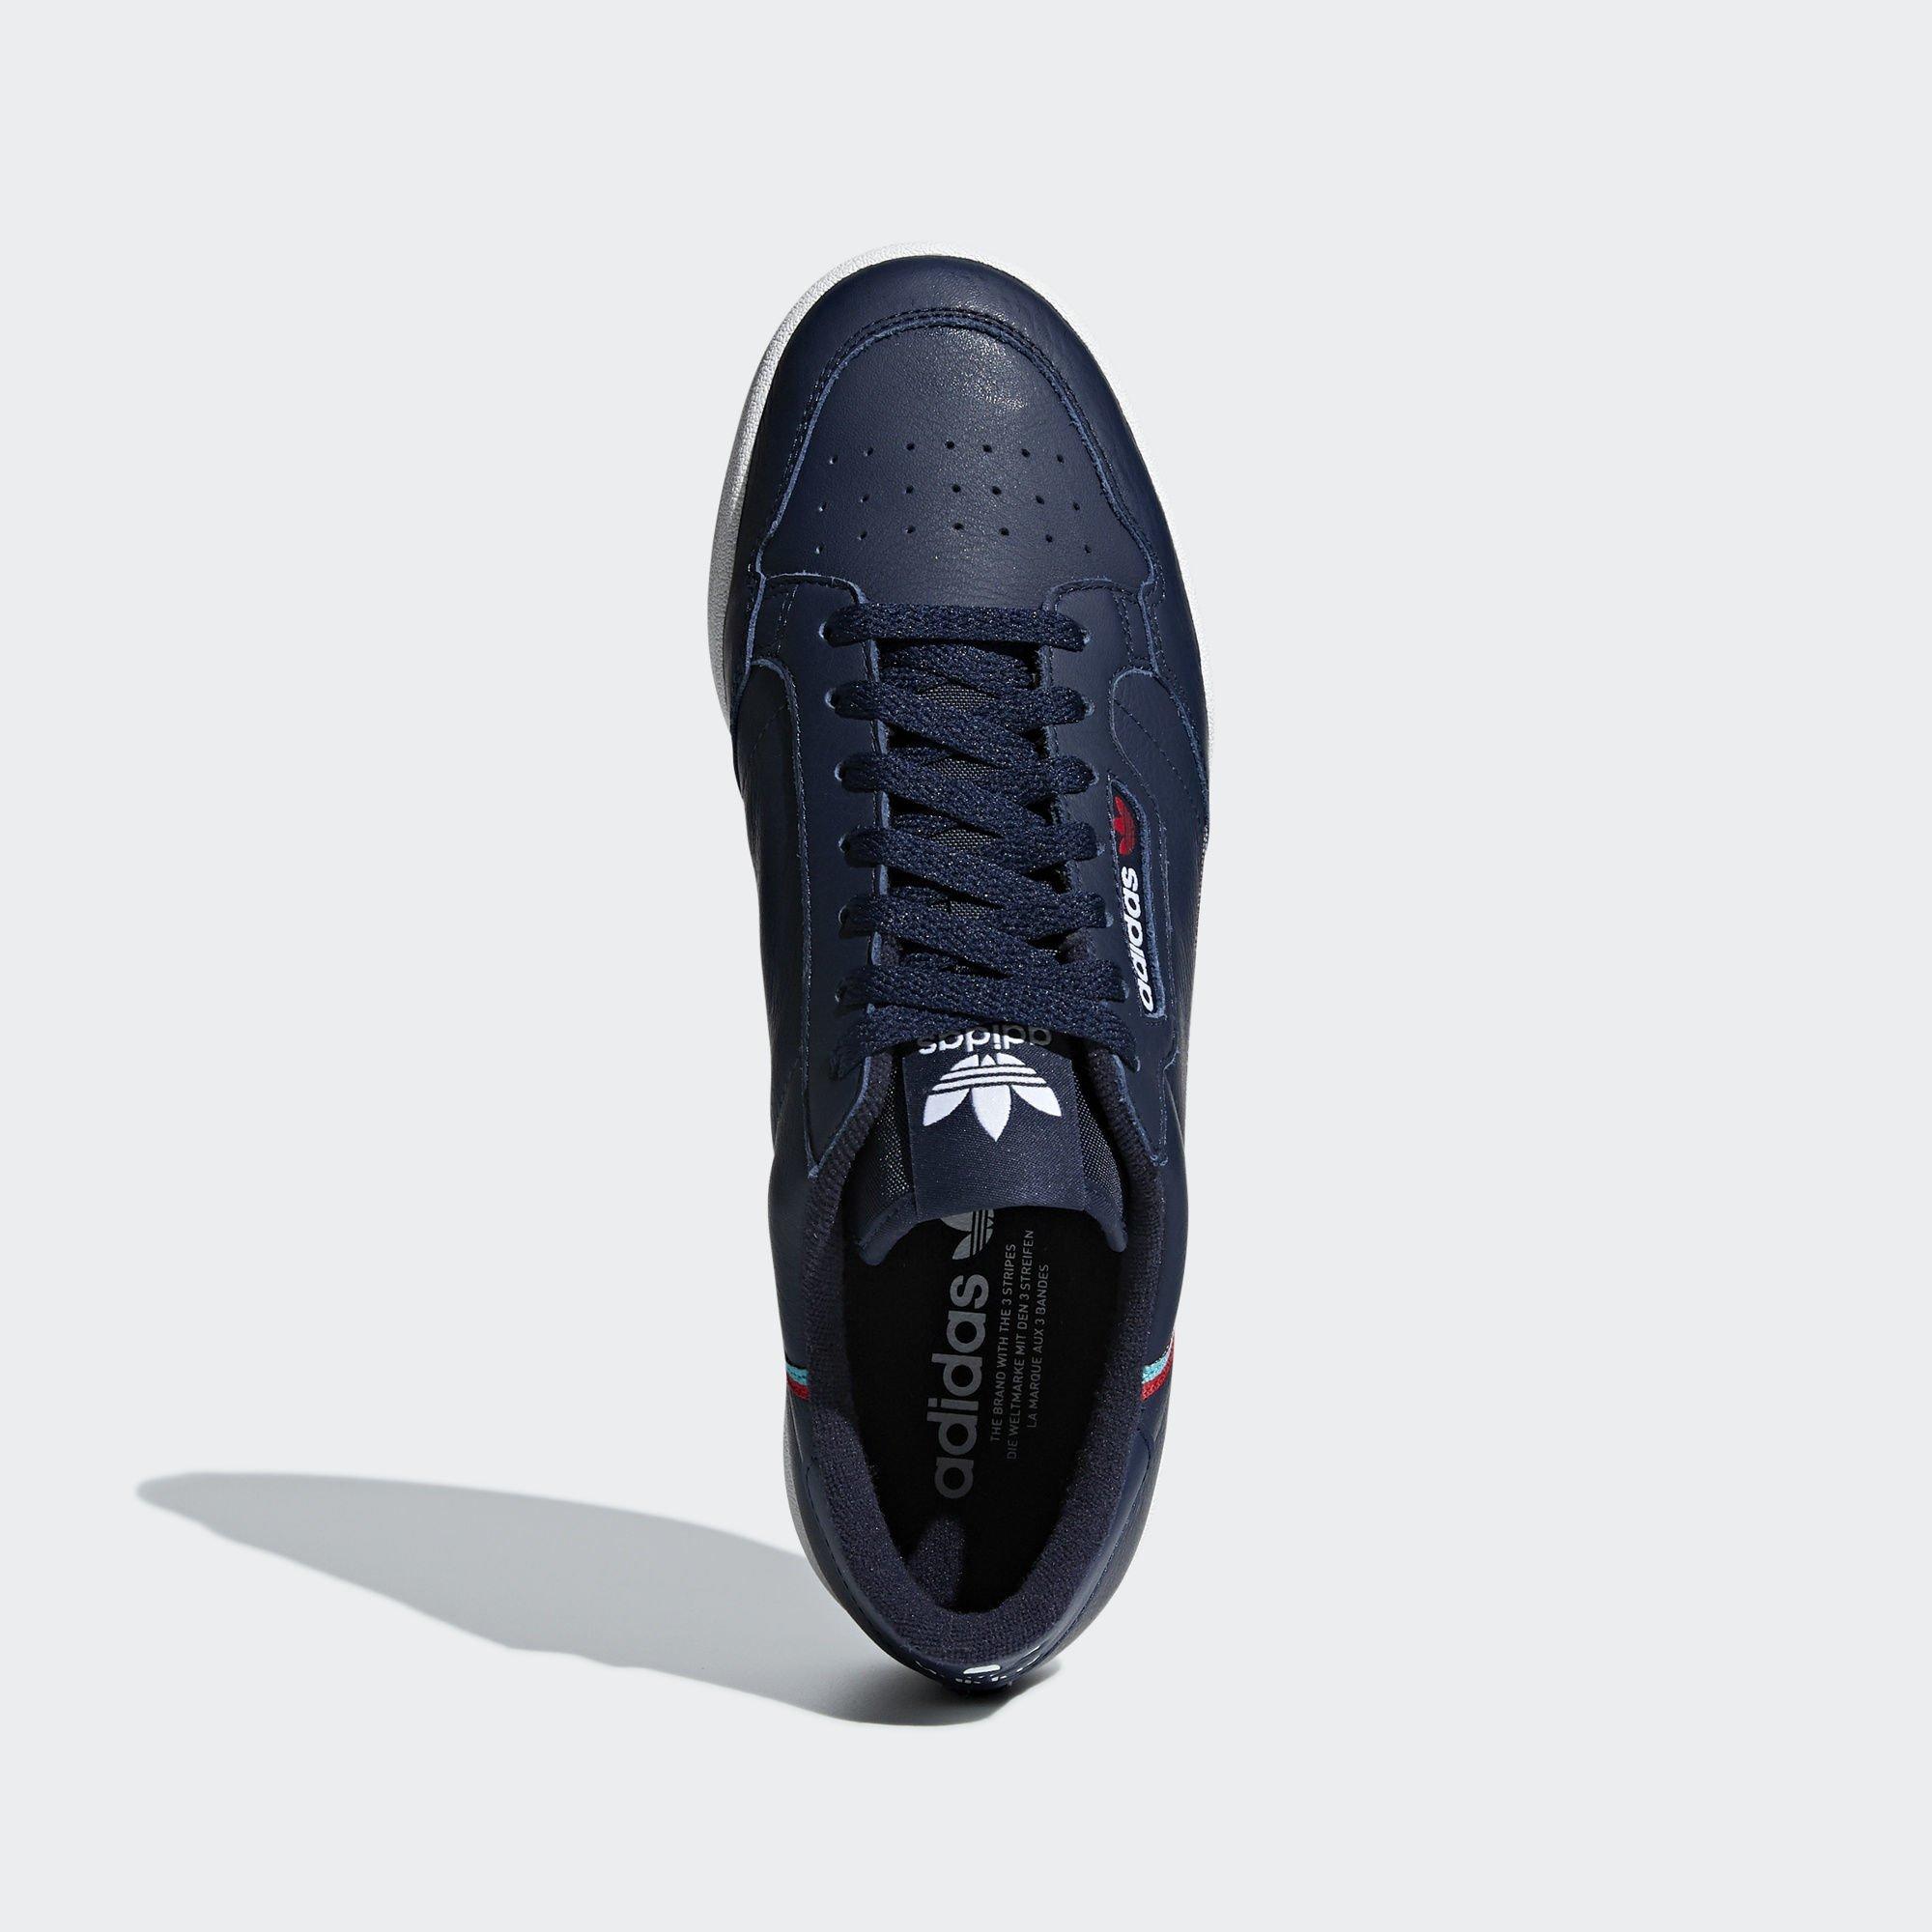 Adidas Continental 80 B41670